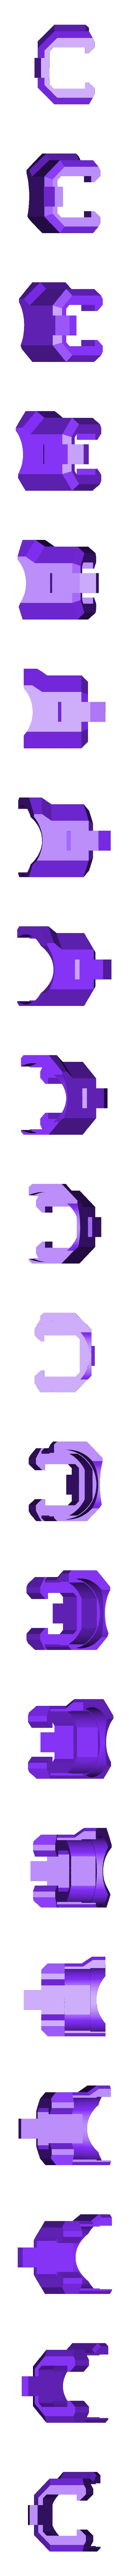 Arm_Right_06_OliveGreen.stl Download STL file Heavy Gun Walker • 3D print design, Jwoong